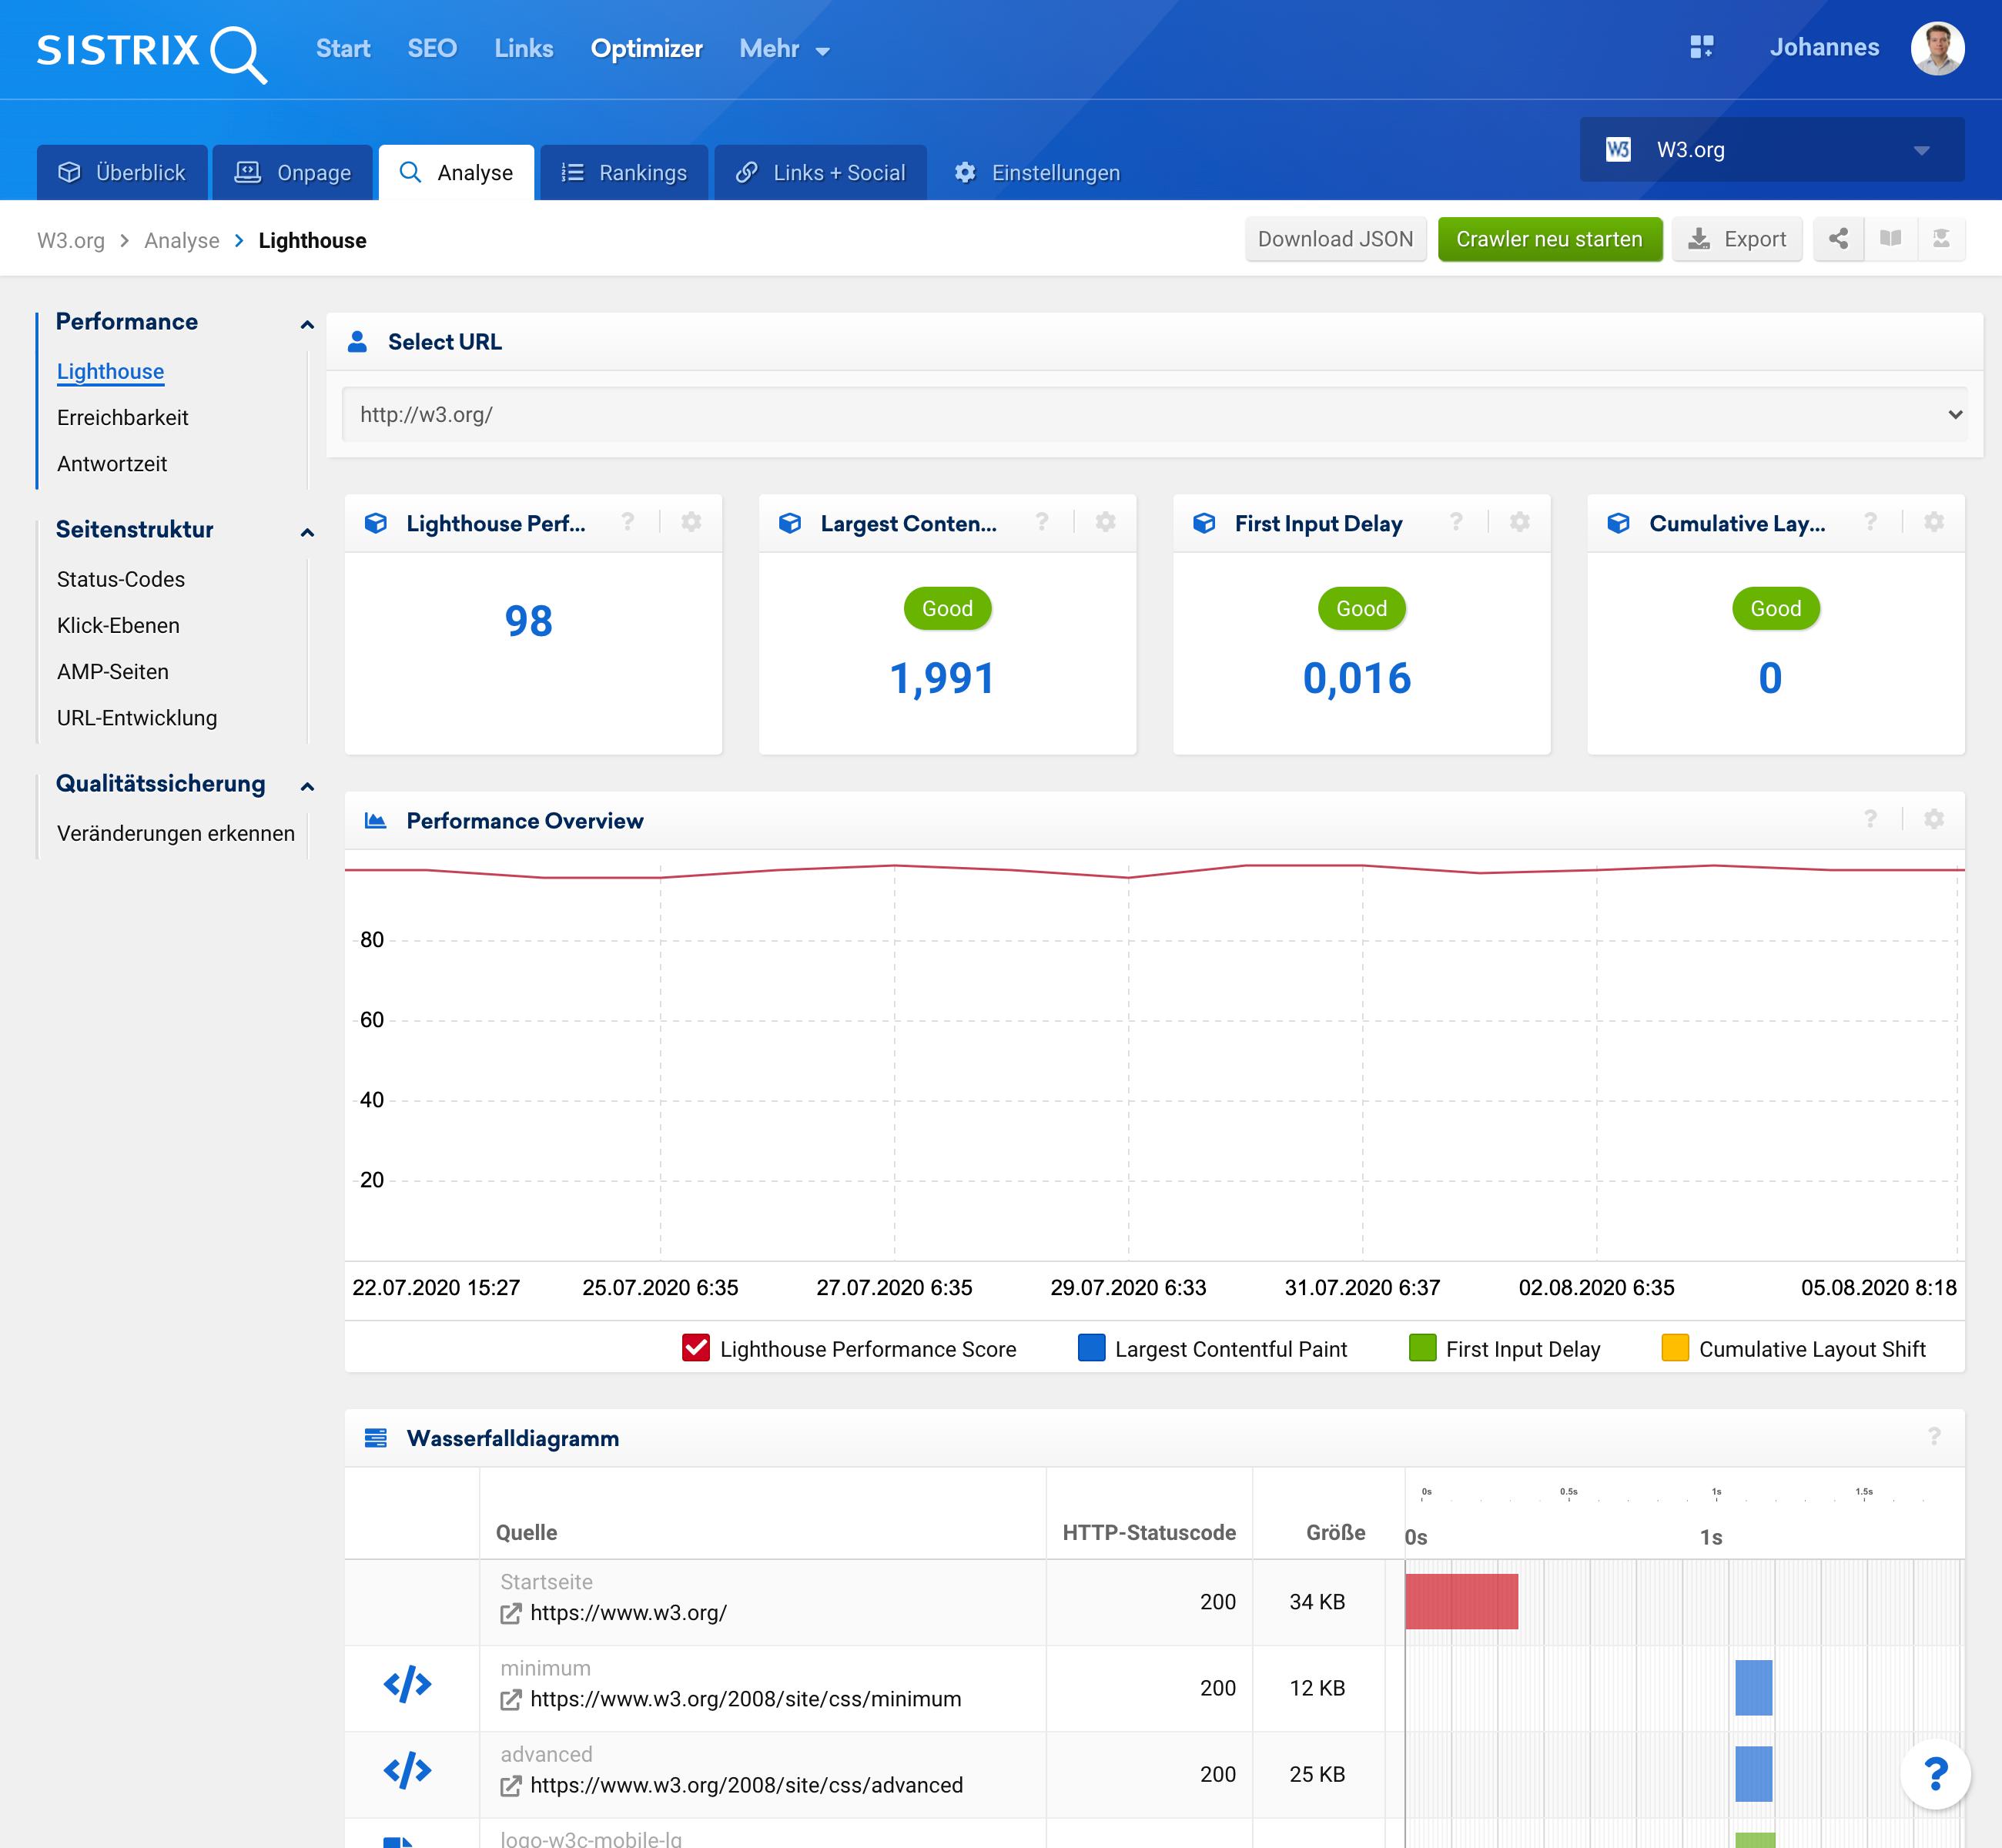 Analyse der Core Web Vitals im SISTRIX Optimizer